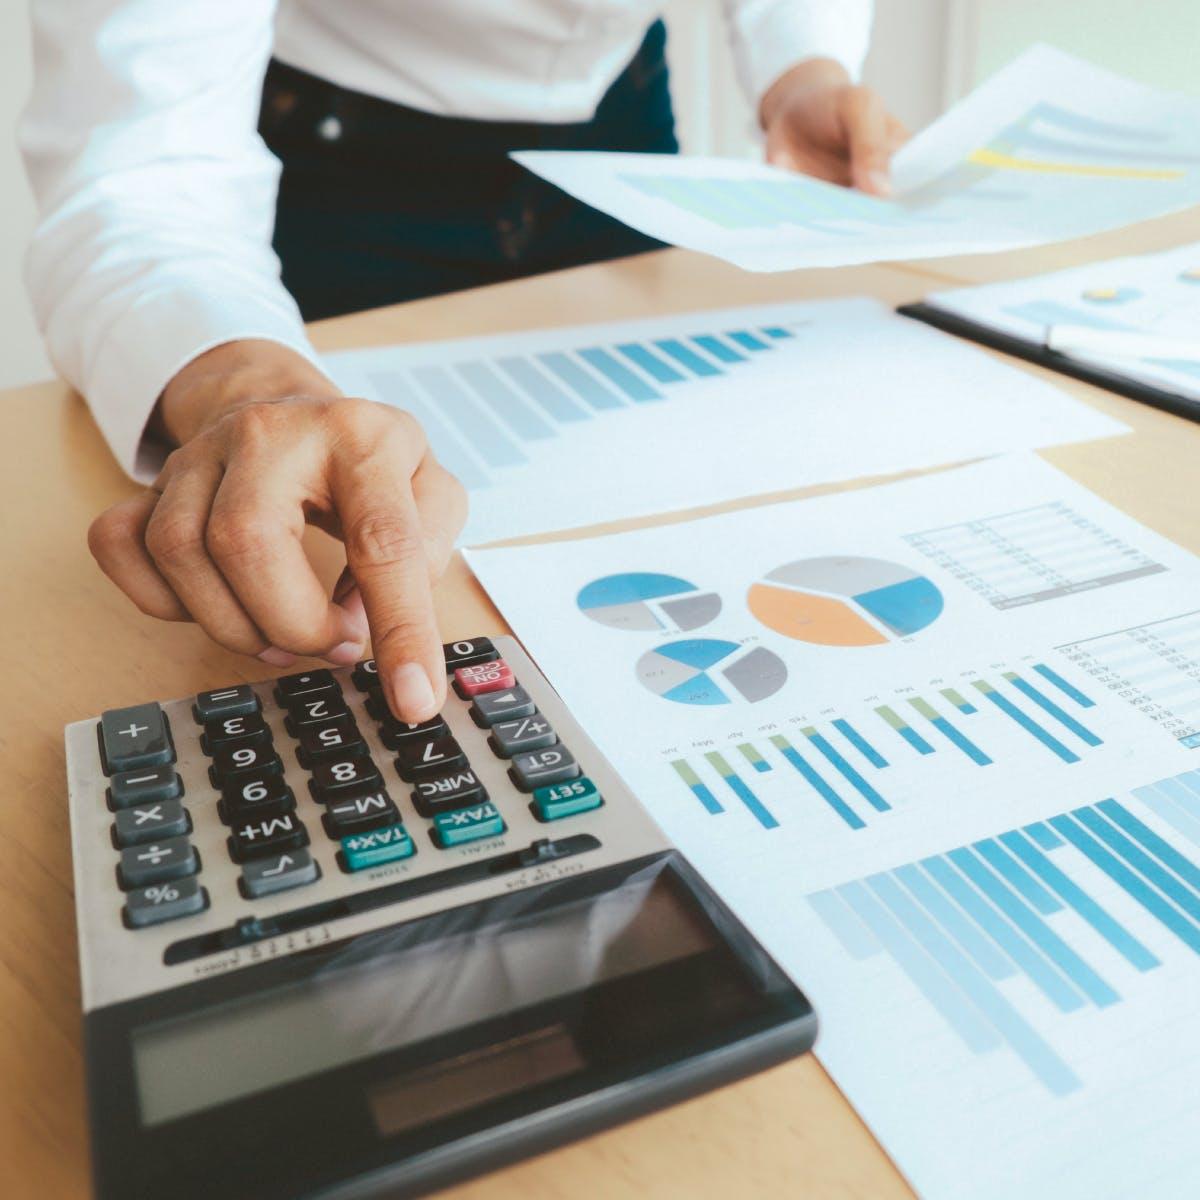 budgeting essentials and development coursera